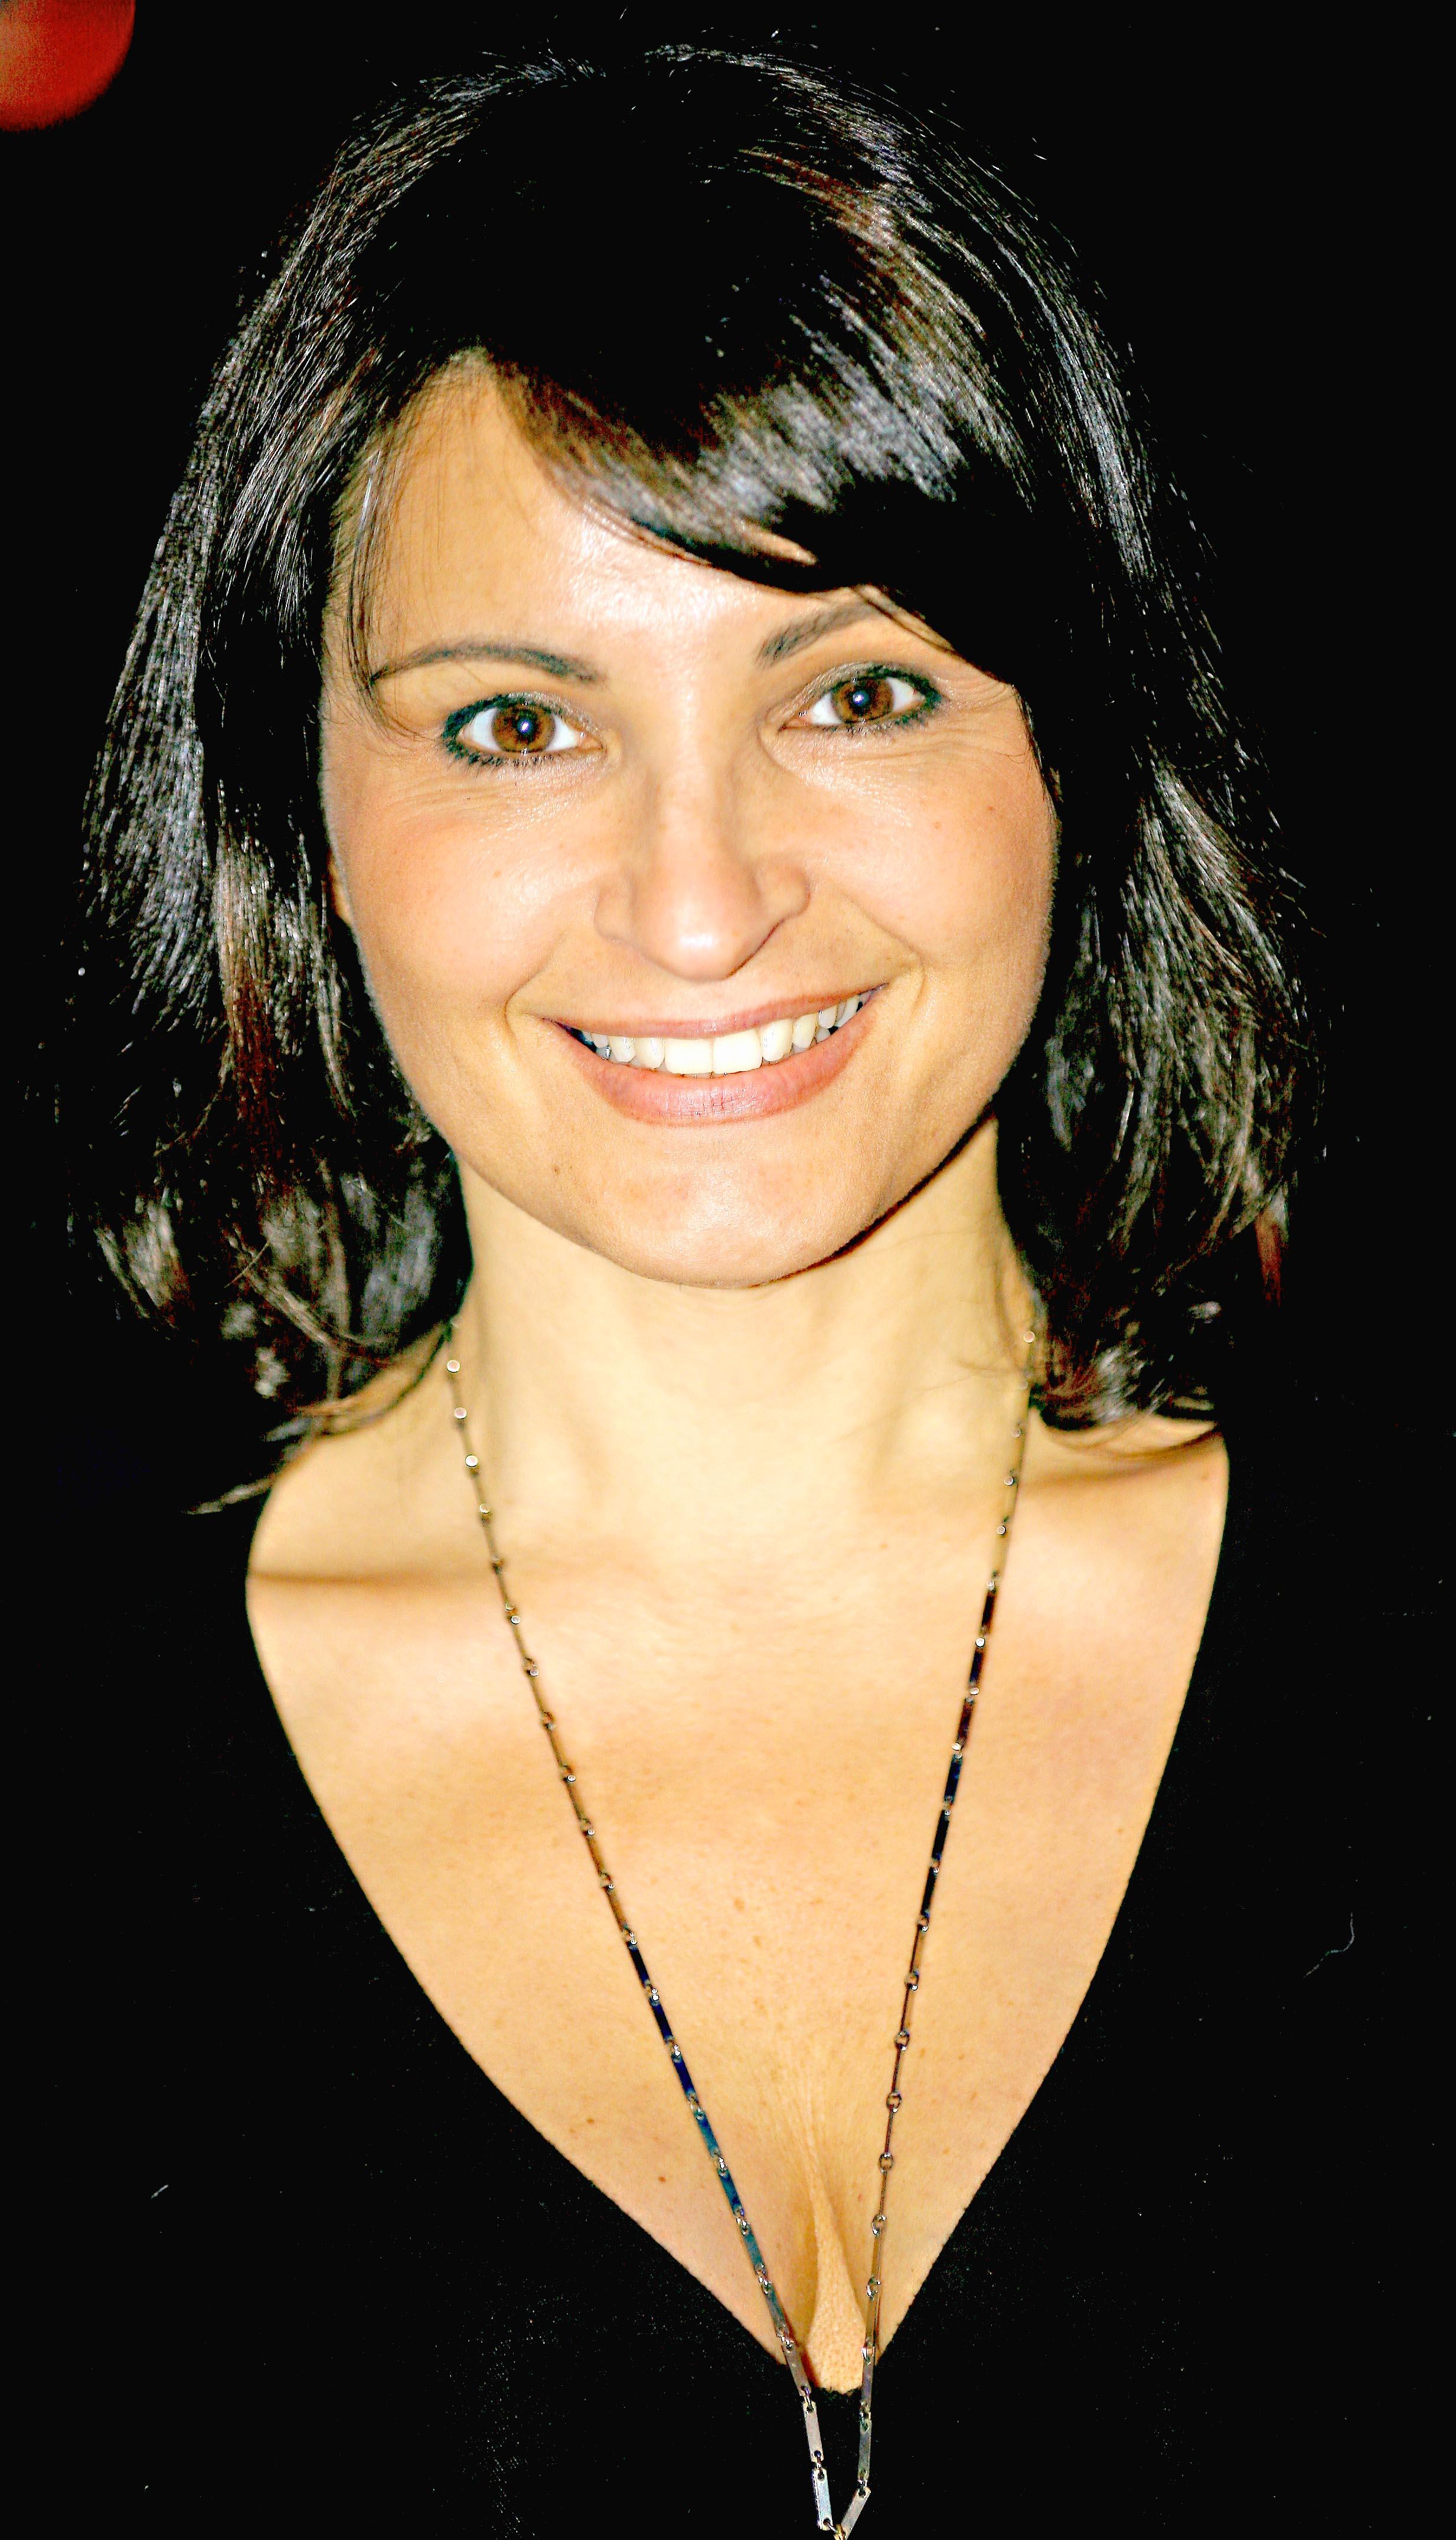 File:Kathrine Narducci 2007.jpg - Wikimedia Commons Kathrine Narducci Sopranos